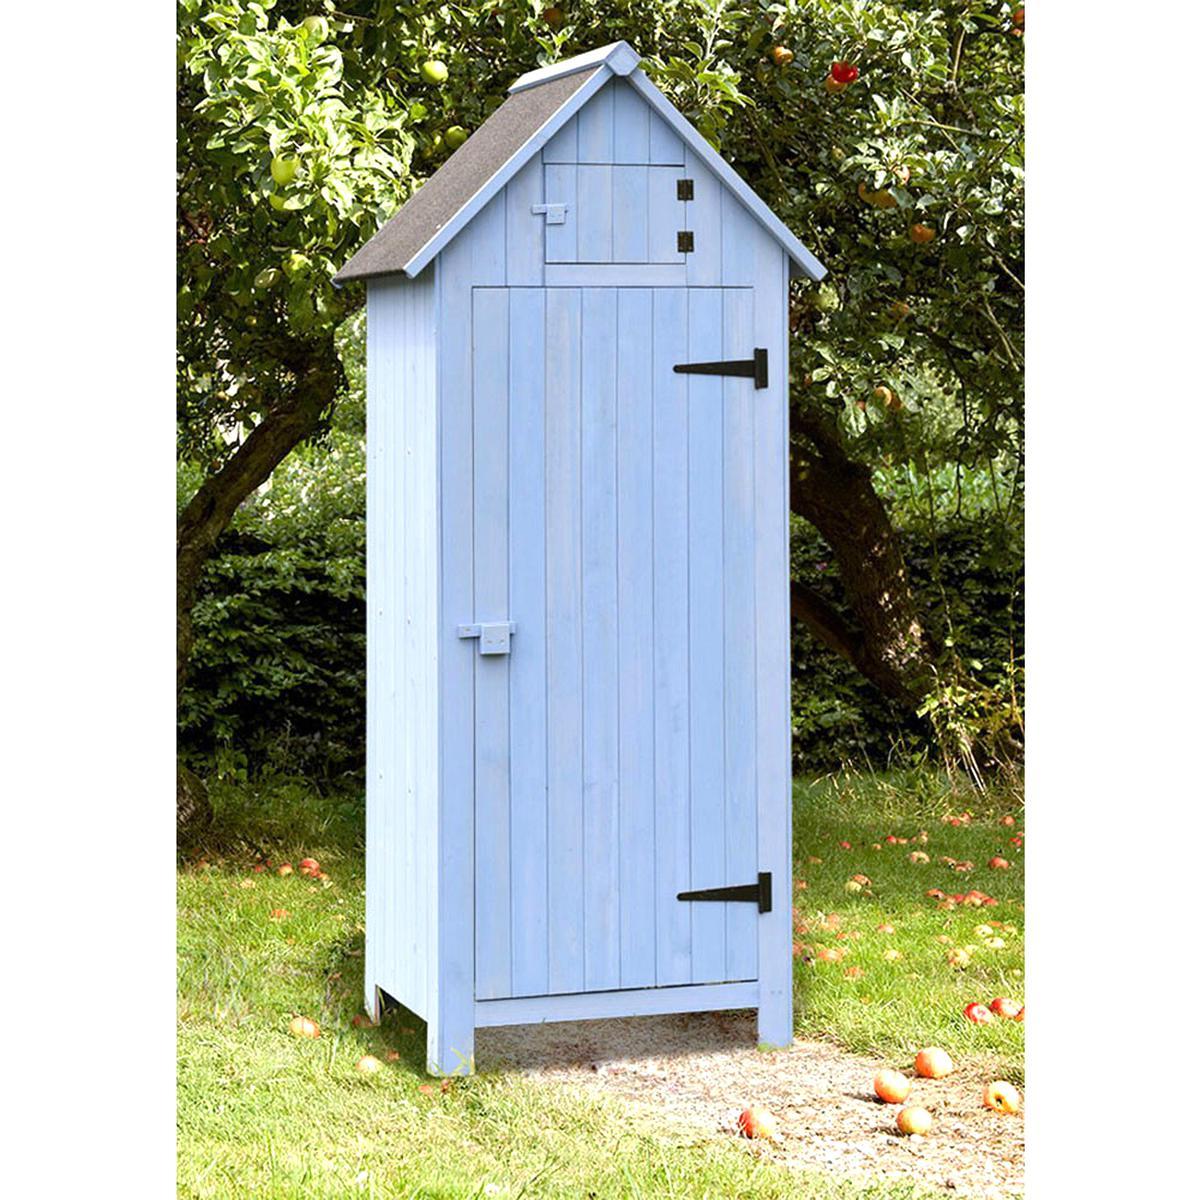 armoire cabine d'occasion